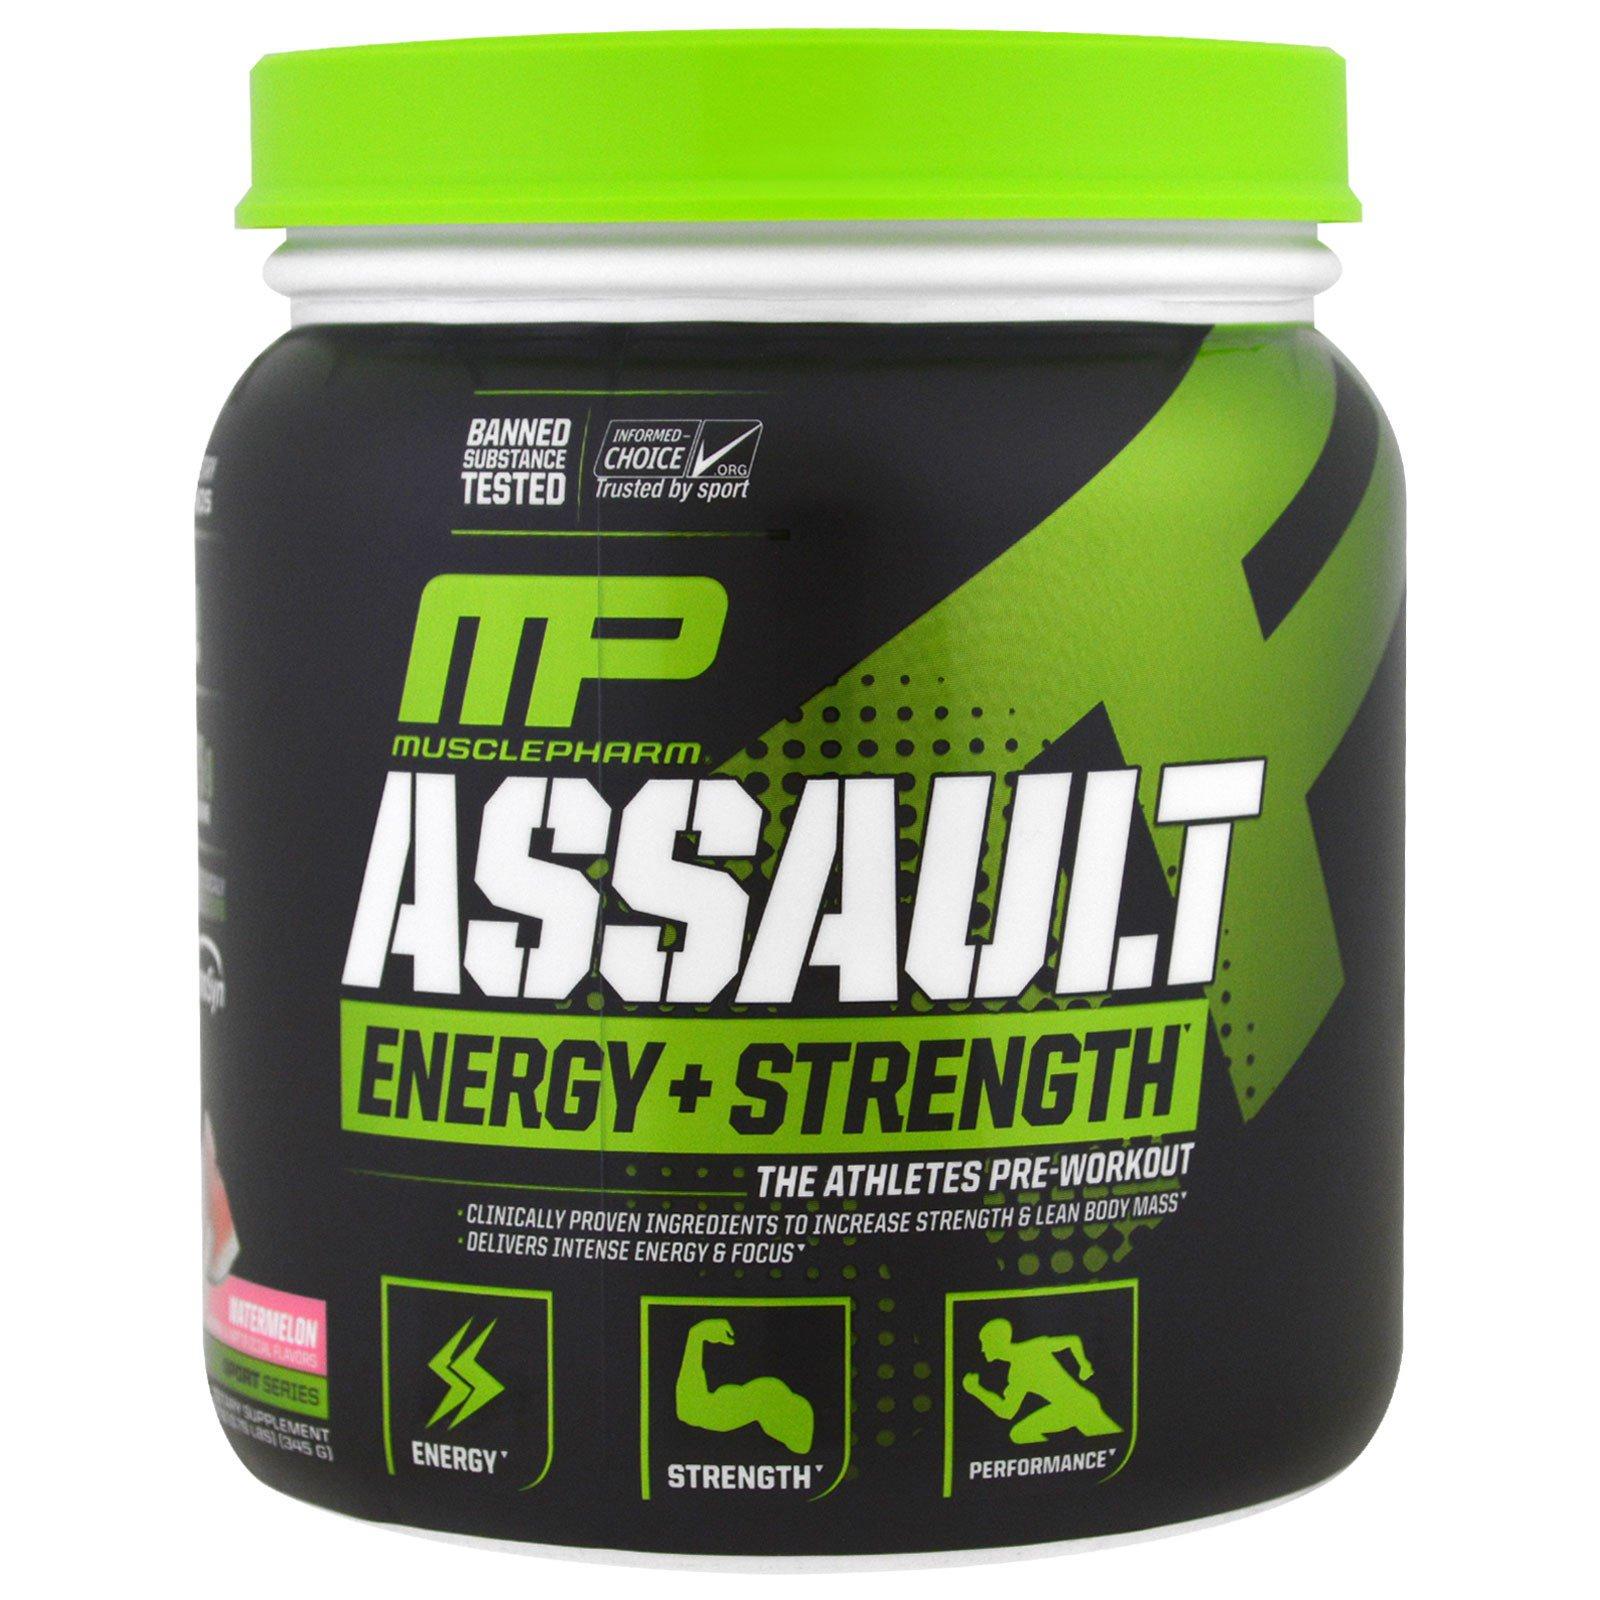 Musclepharm Ault Energy Strength Pre Workout Watermelon 12 17 Oz